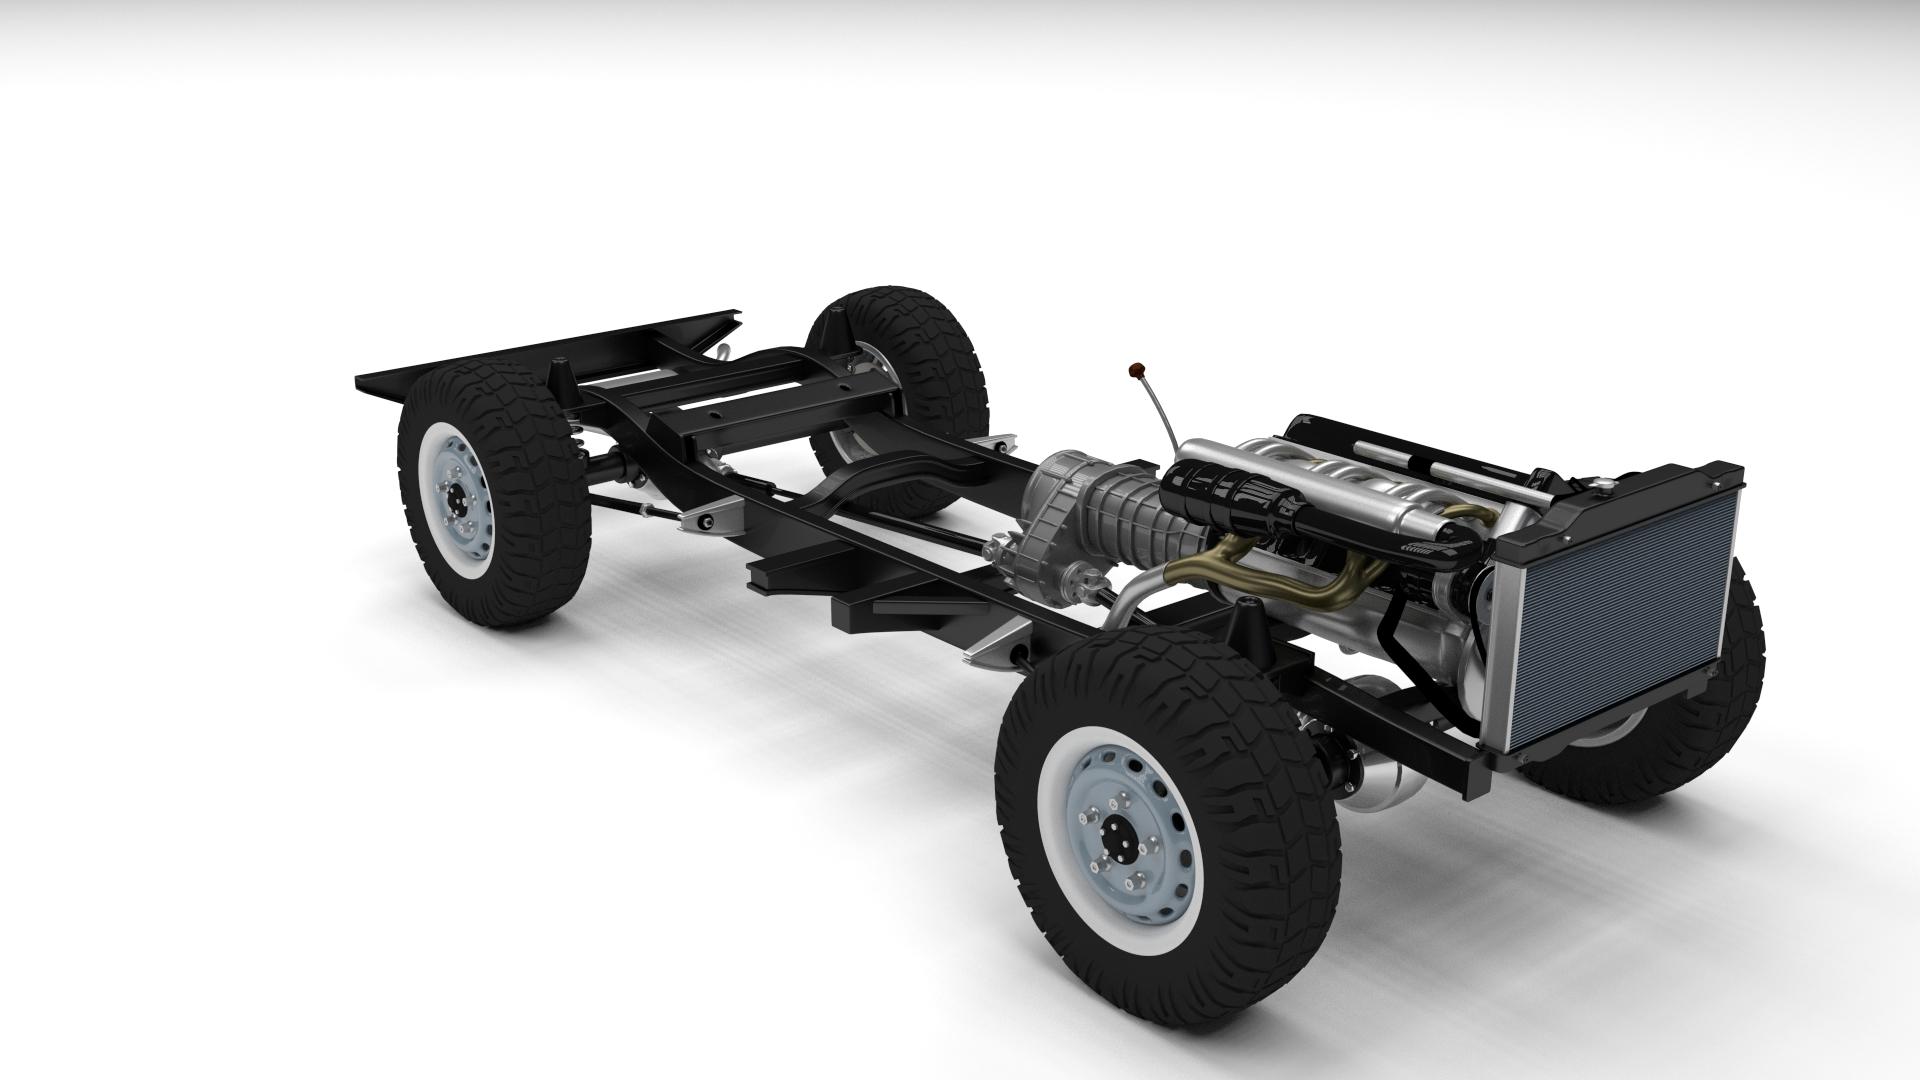 Full Land Rover Defender 110 Utility Station Wagon rev by dragosburian